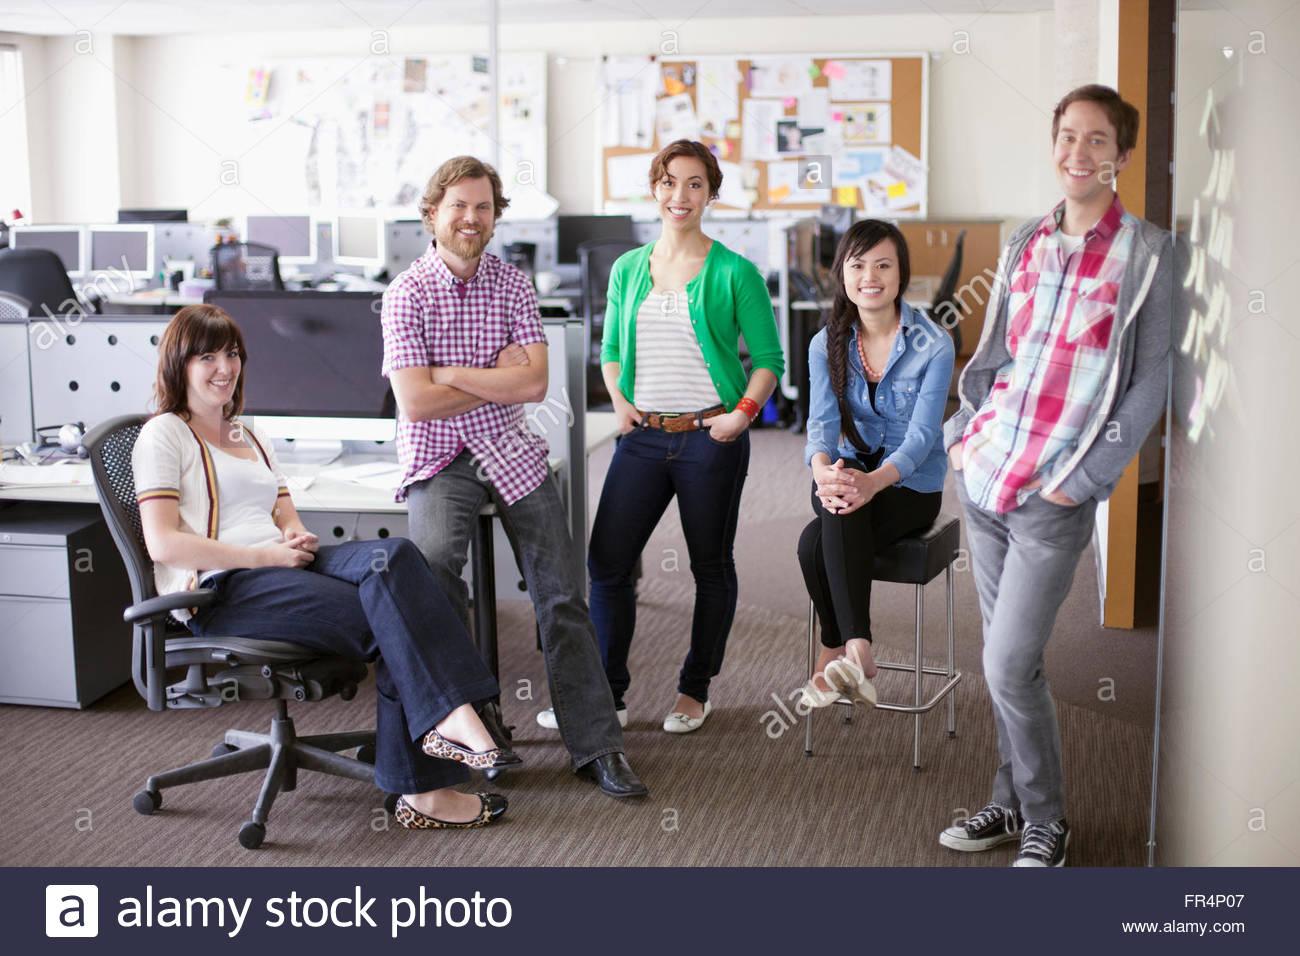 portrait of trendy, creative team in office - Stock Image